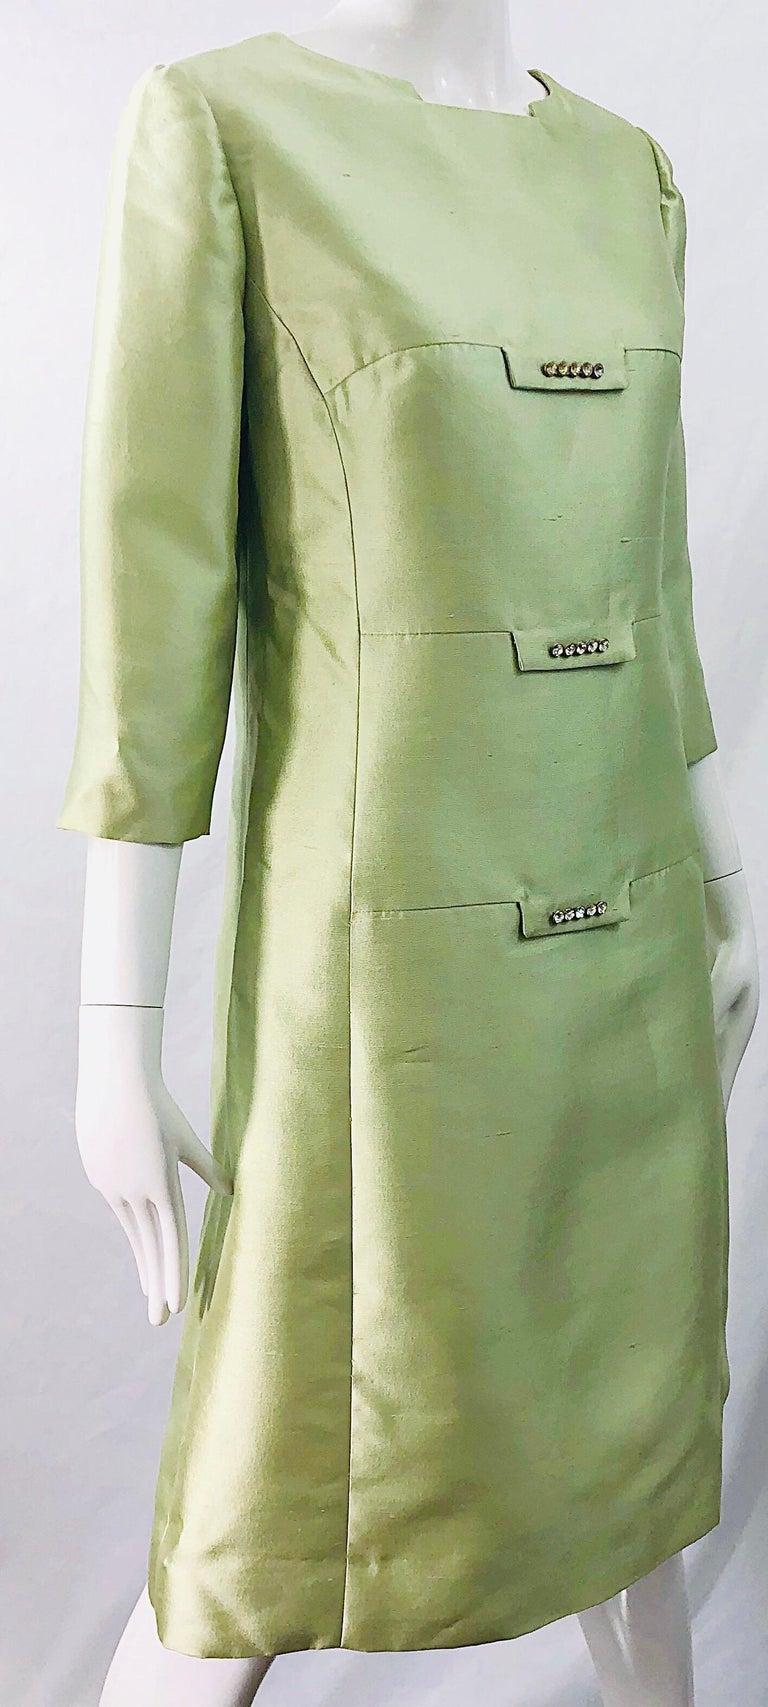 Chic 1960s Mint Green Silk Shantung Rhinestone Vintage 60s A Line Dress For Sale 1